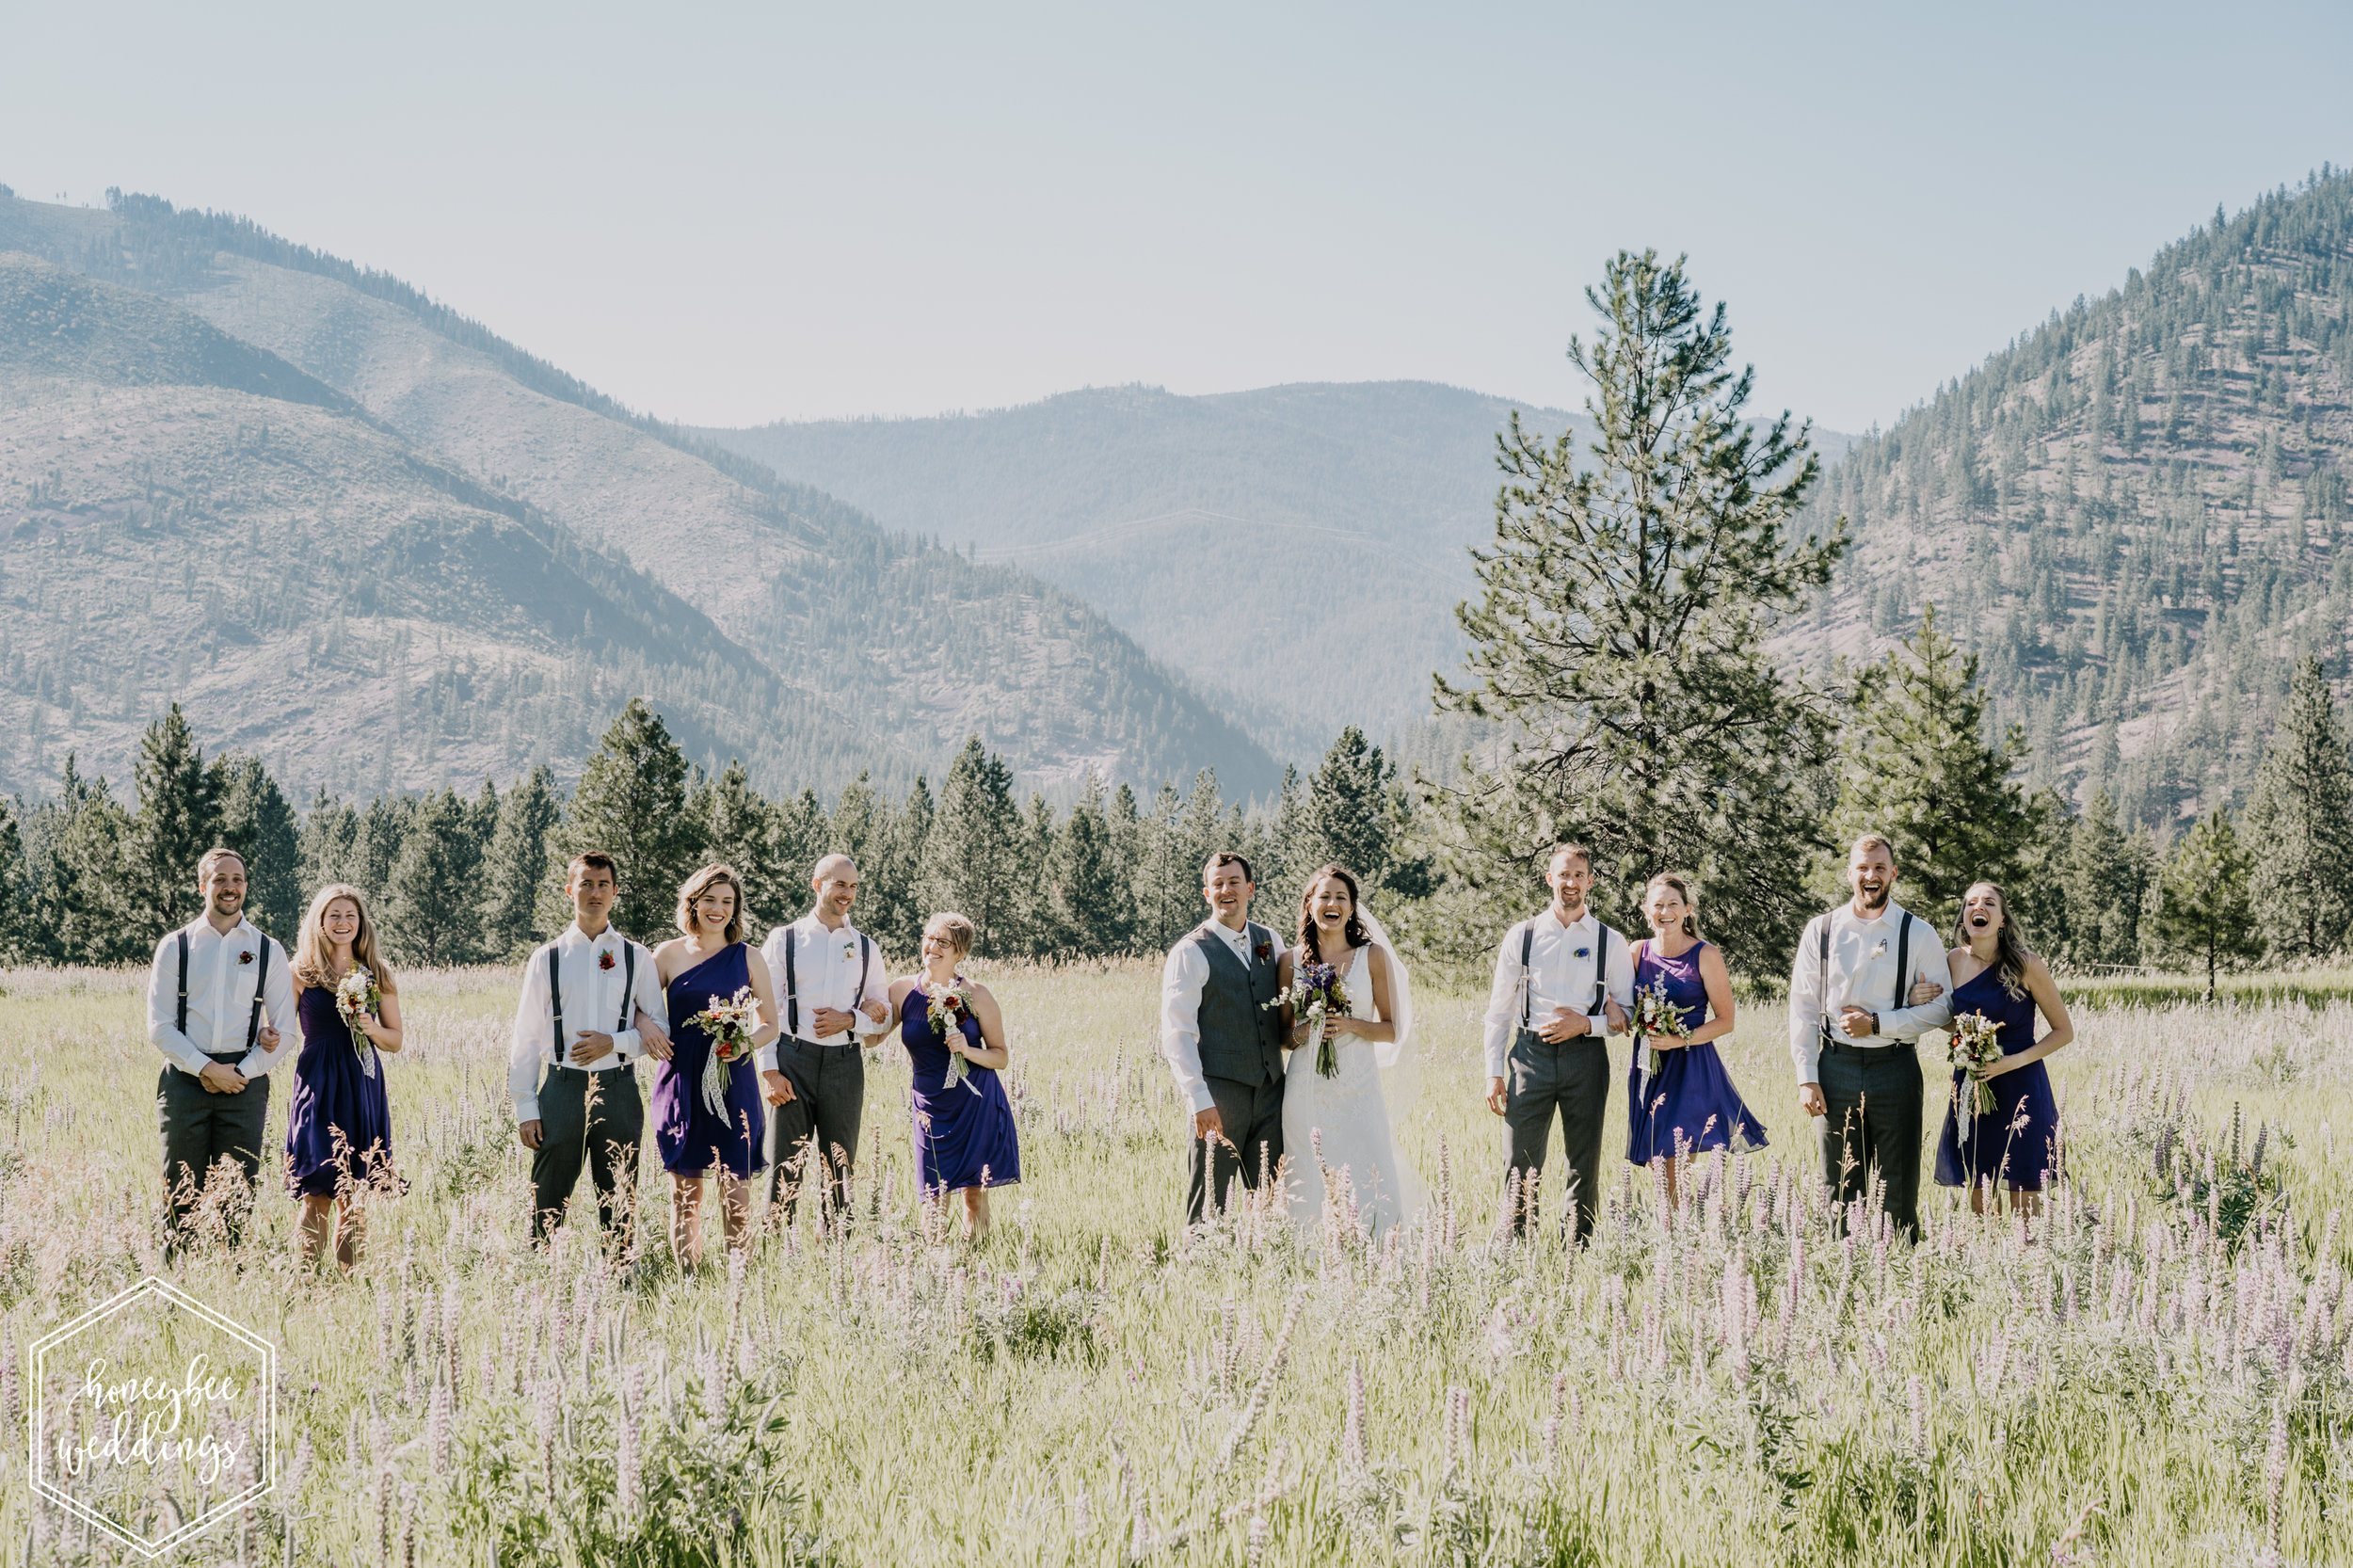 396 White Raven Wedding_Montana Wedding Photographer_Honeybee Weddings_ Meghan Maloney + Arza Hammond 2018-00209.jpg